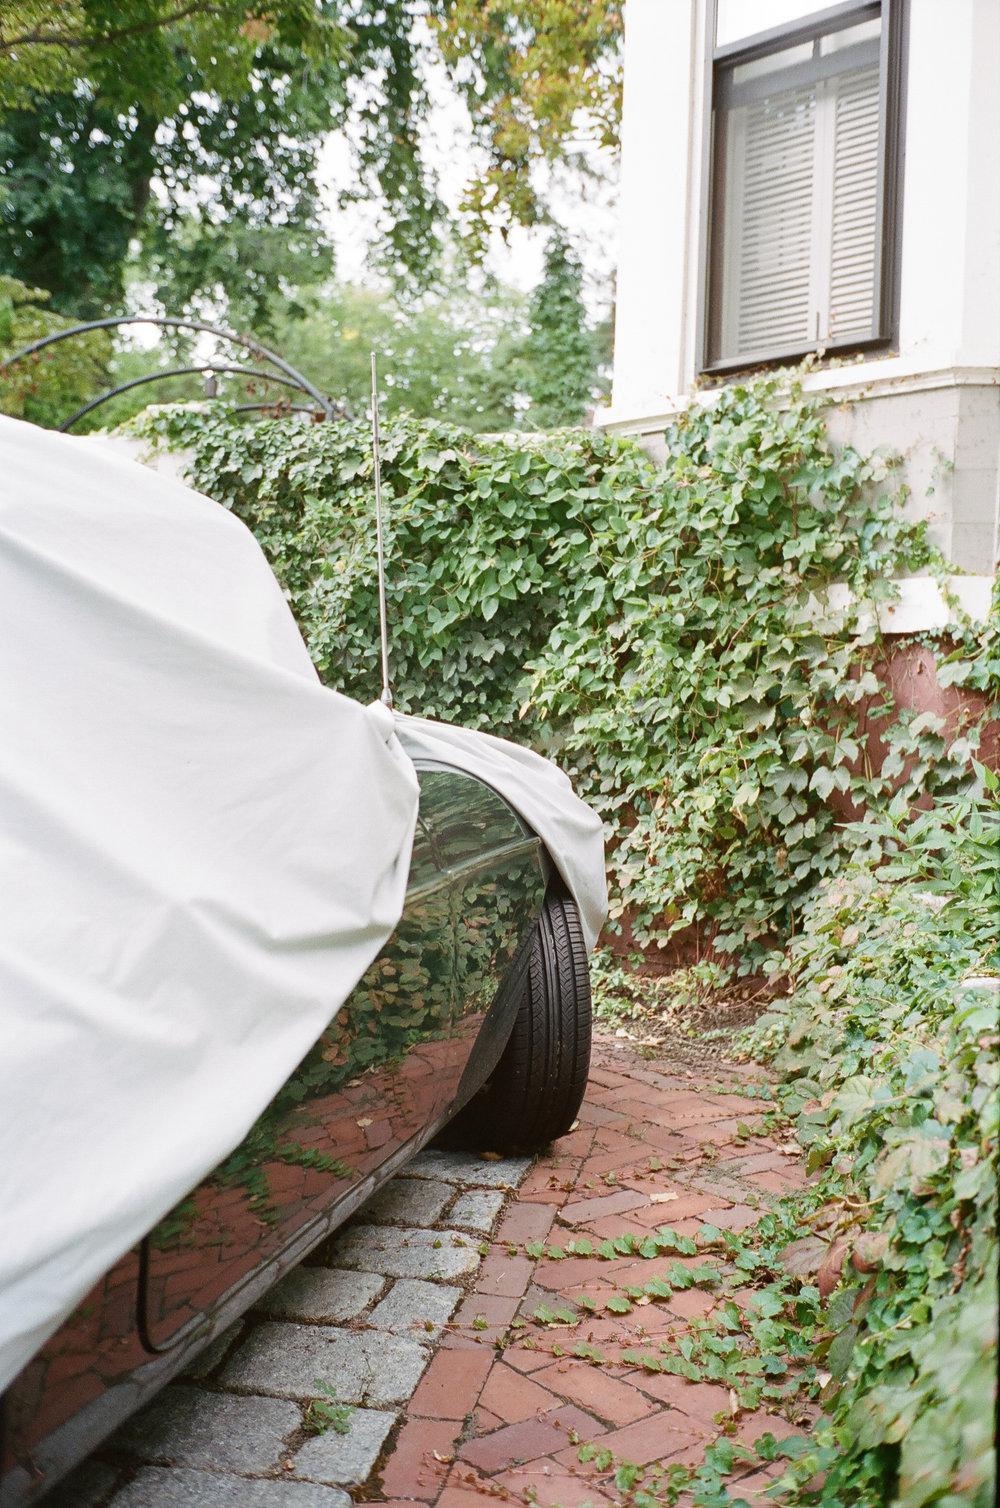 LeicaM6092017-1003.jpg